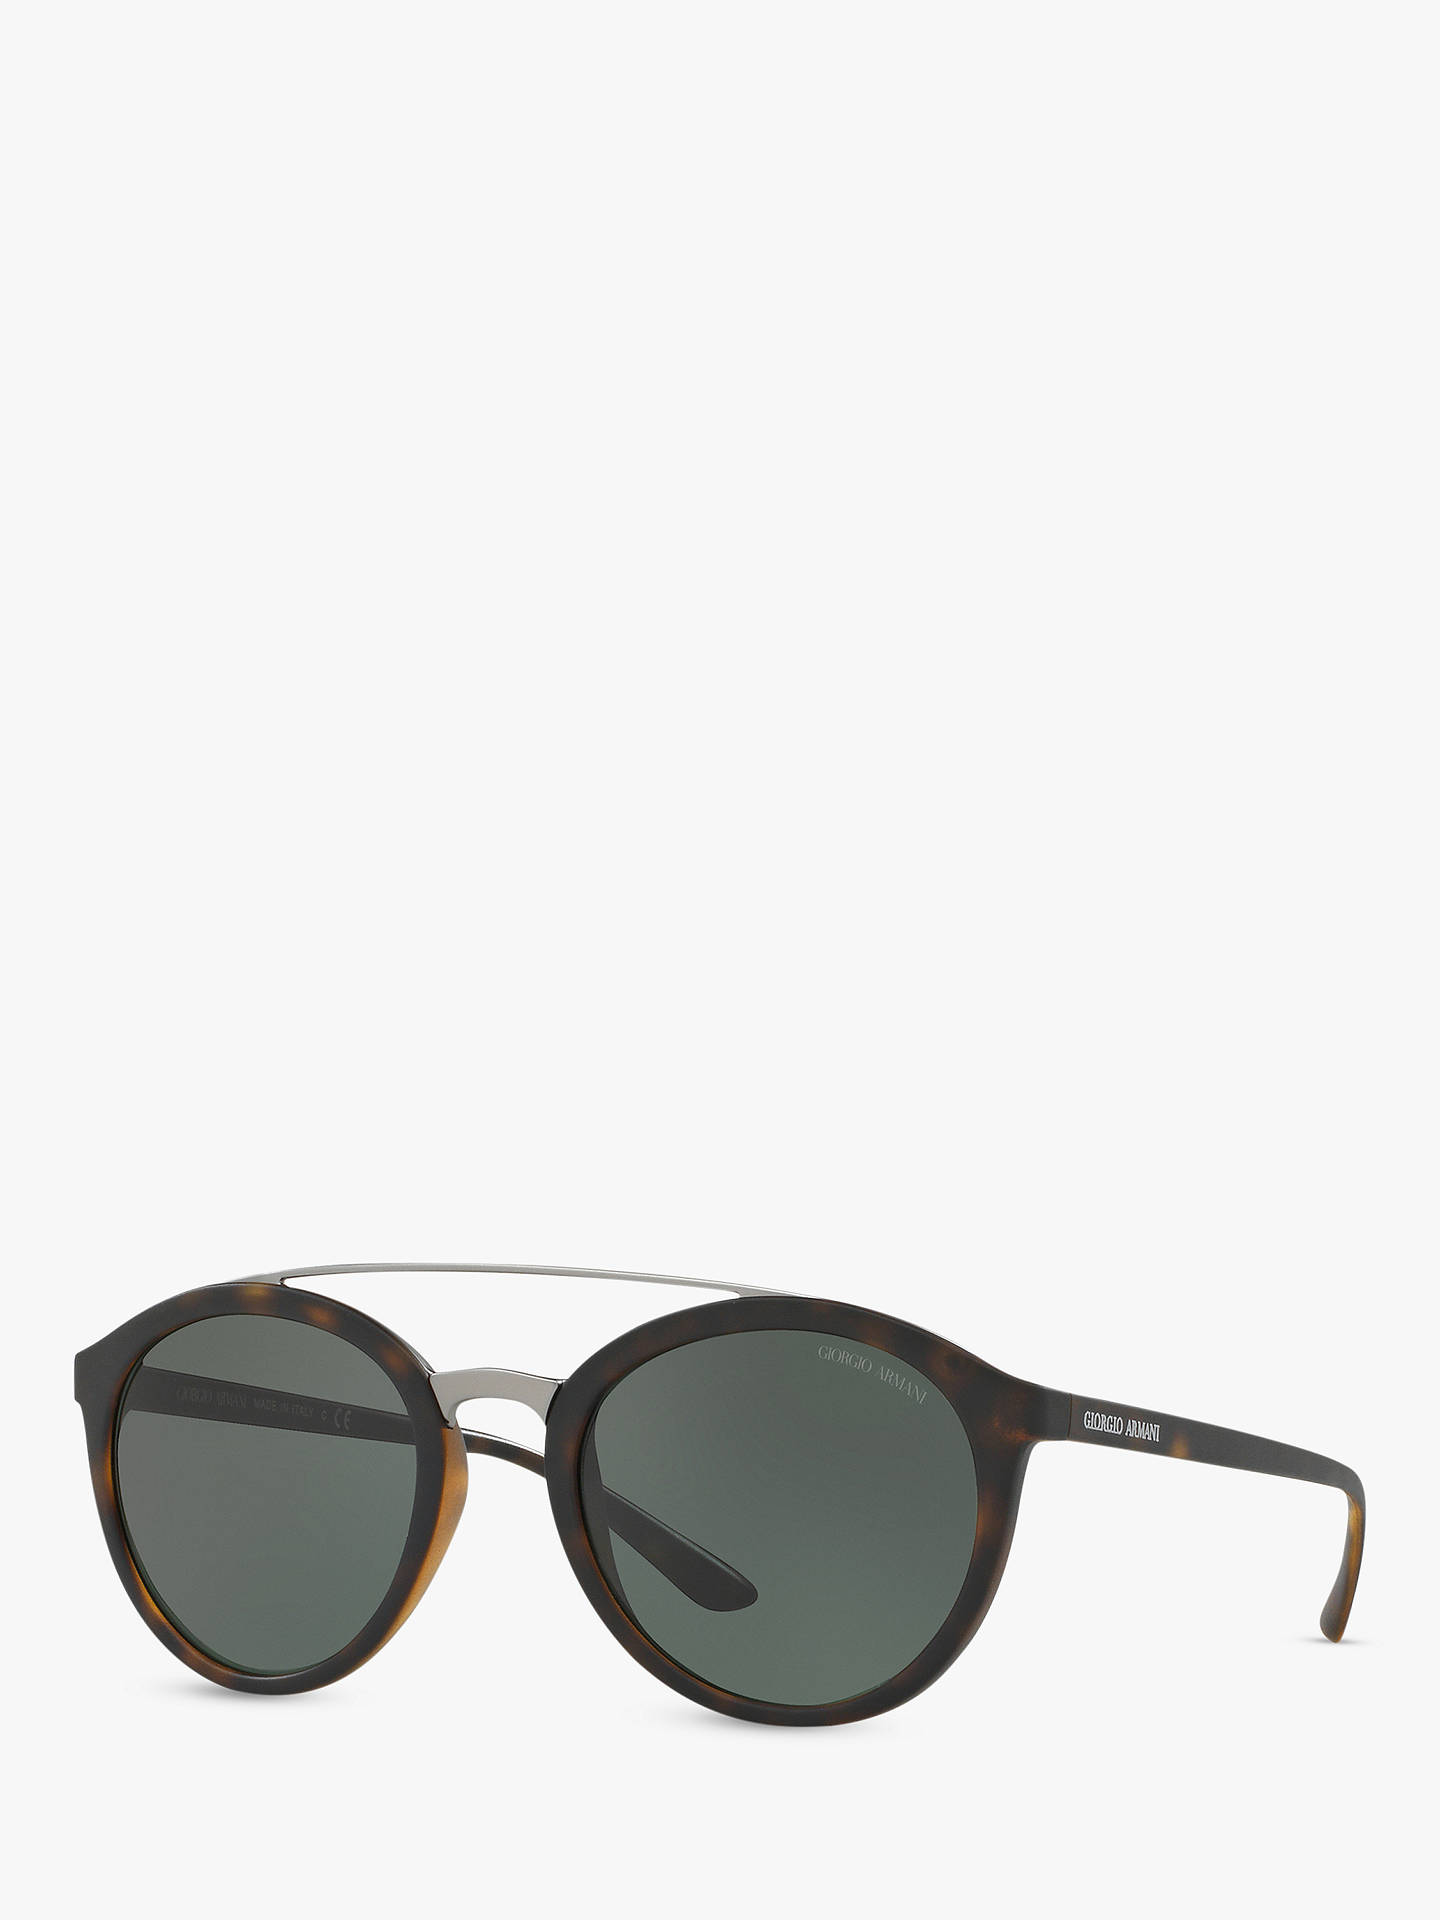 c7c663419d Giorgio Armani AR8083 Women's Round Sunglasses, Tortoise/Grey at ...